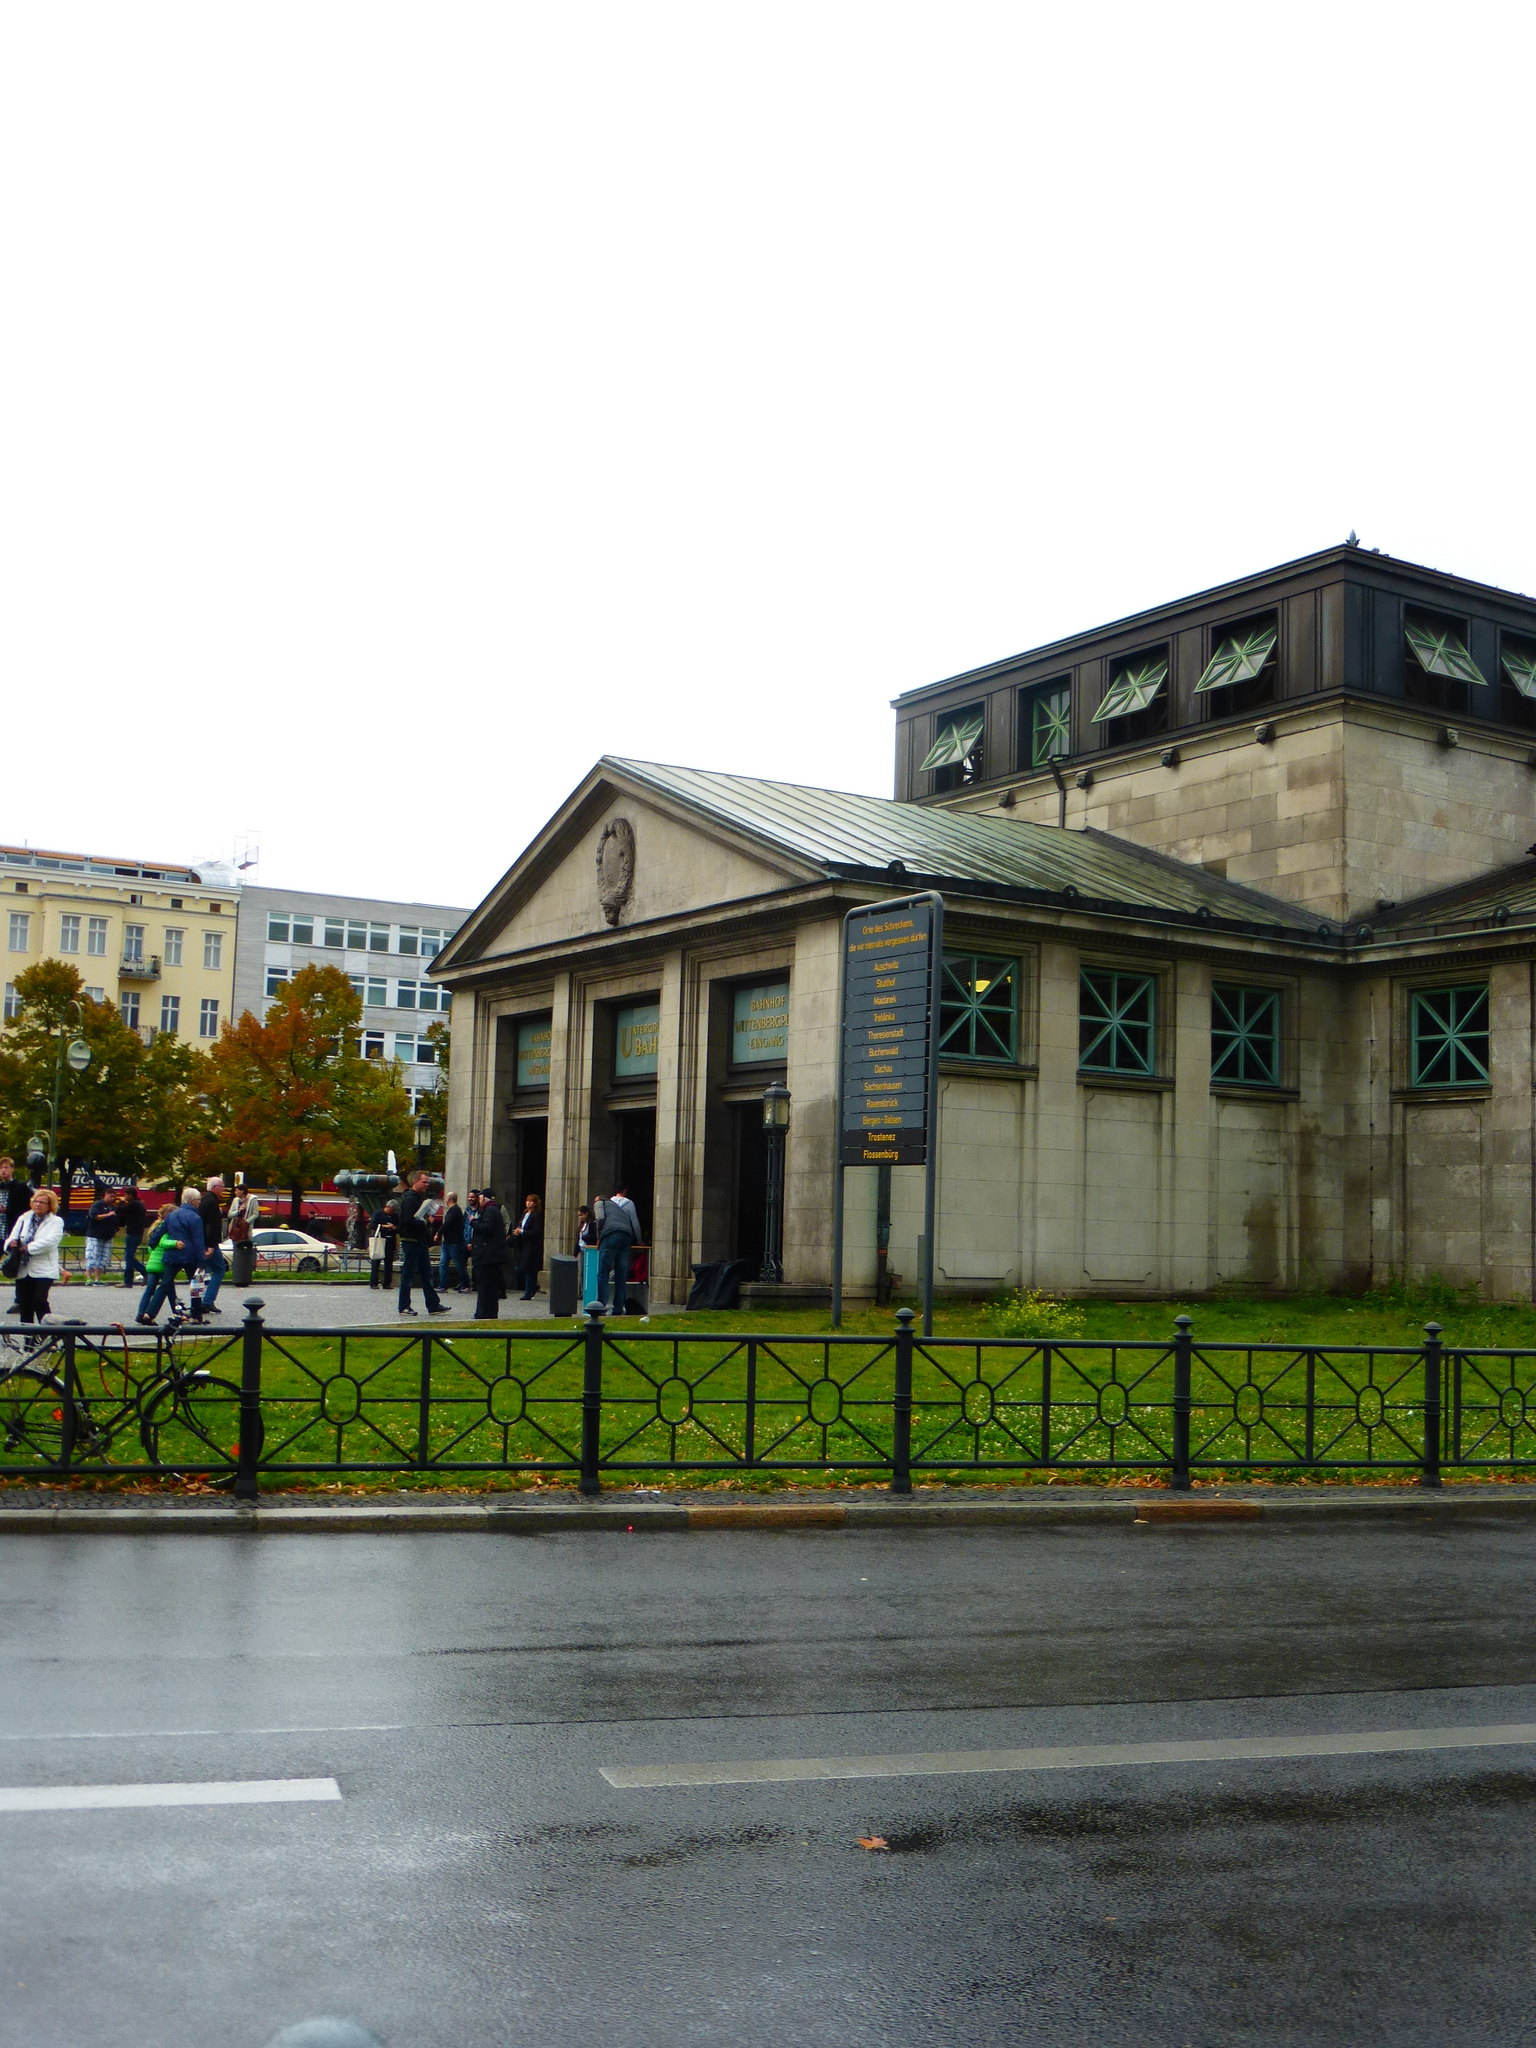 Berlin, September 2014